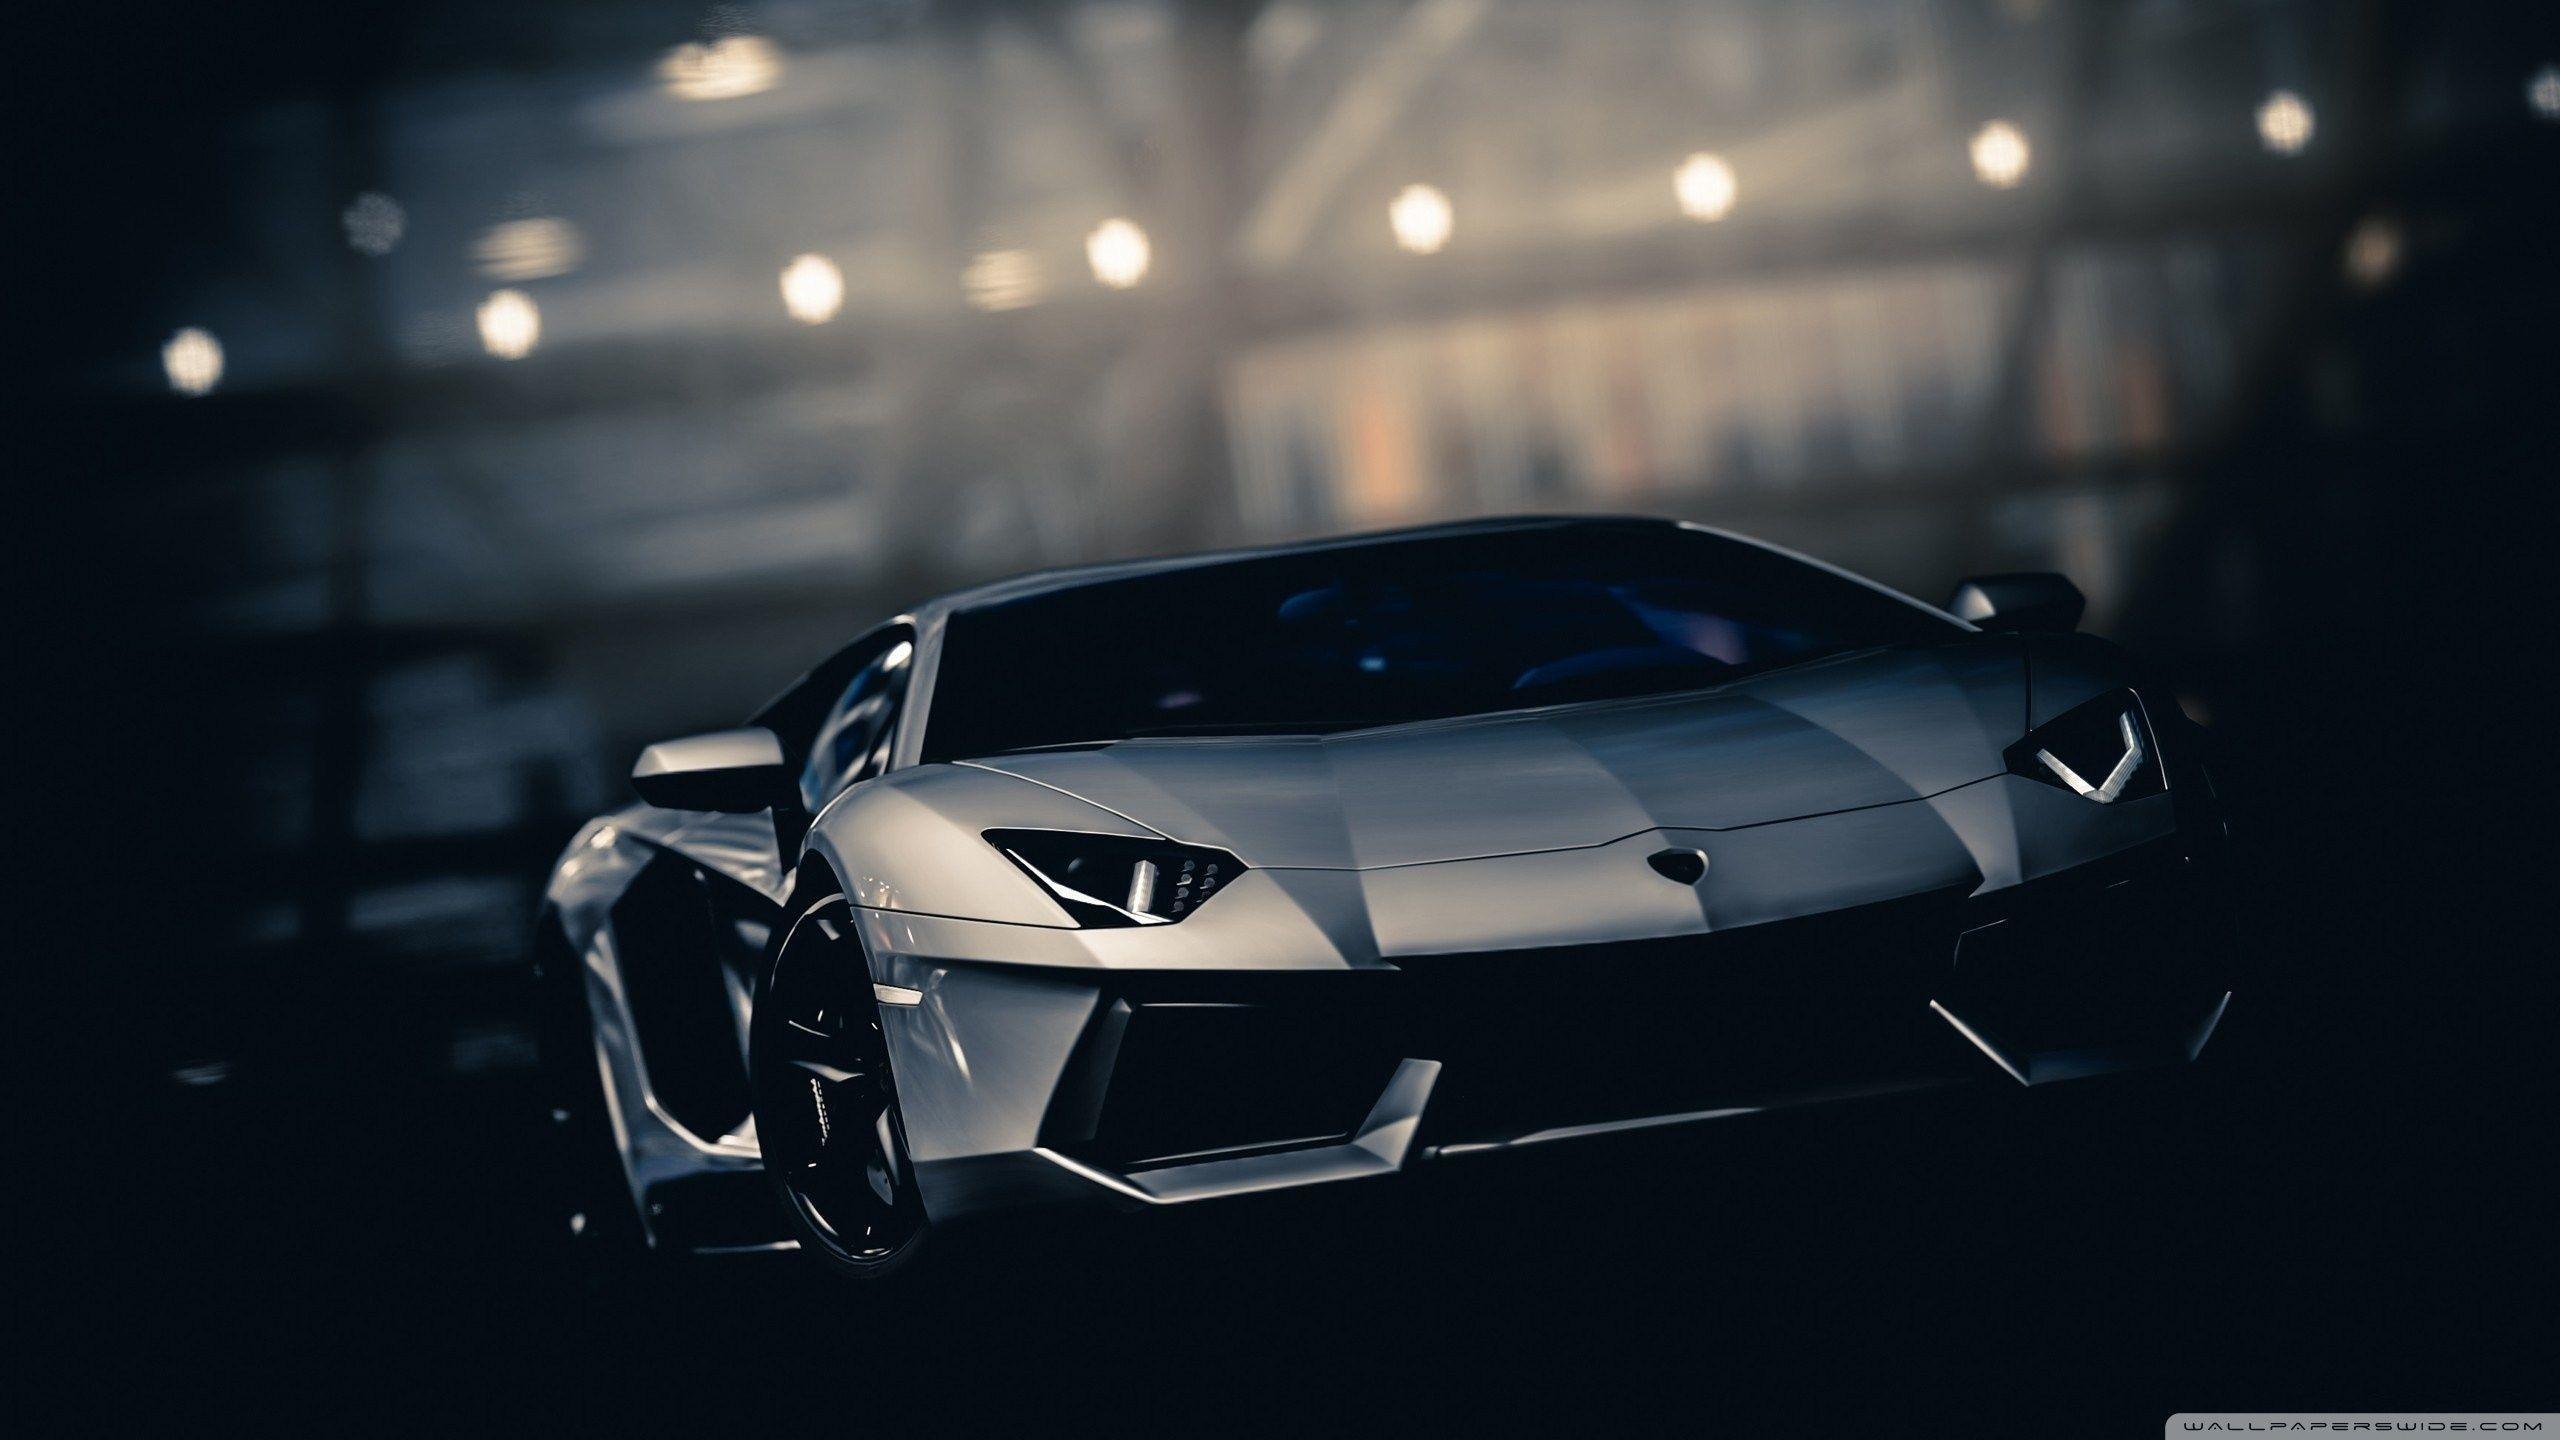 Lamborghini Windows Background